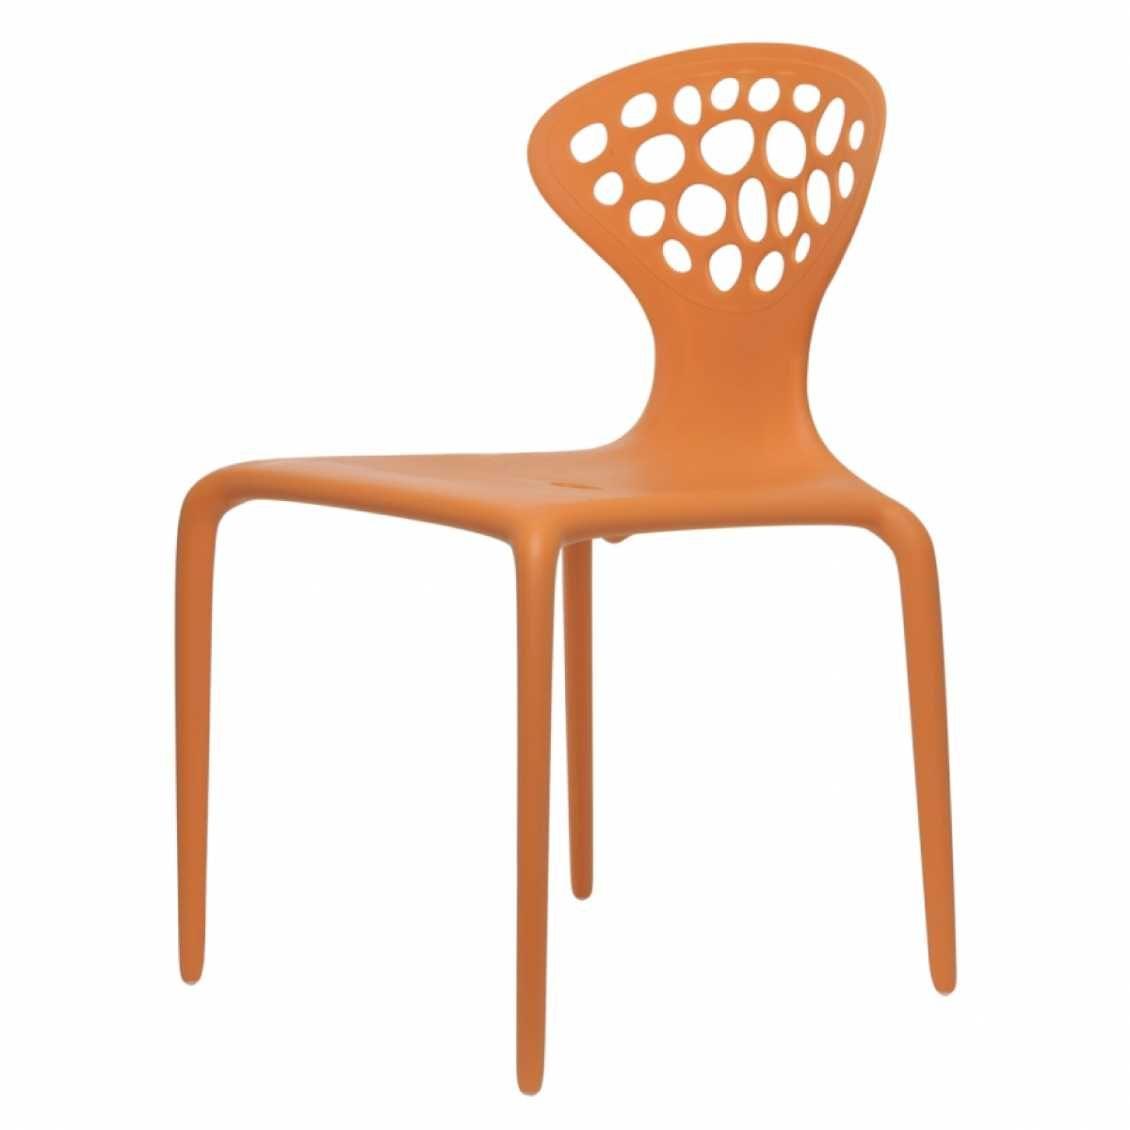 Moroso Supernatural stoel | InteriorWorks